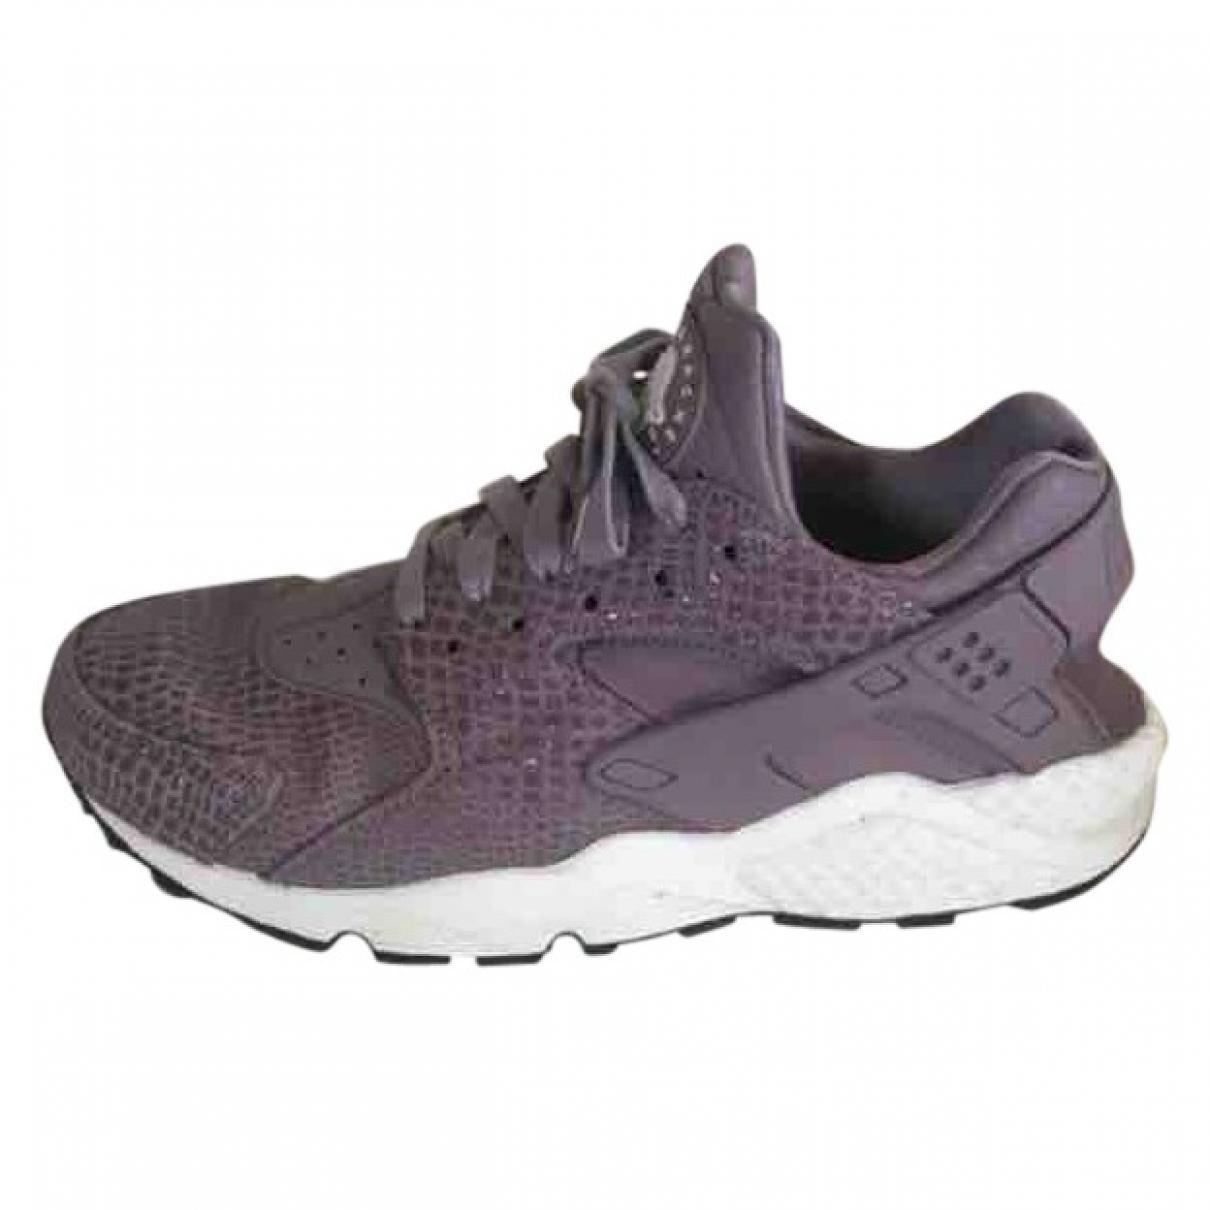 Wholesale price Nike Air Vortex Leather Sneaker Herren